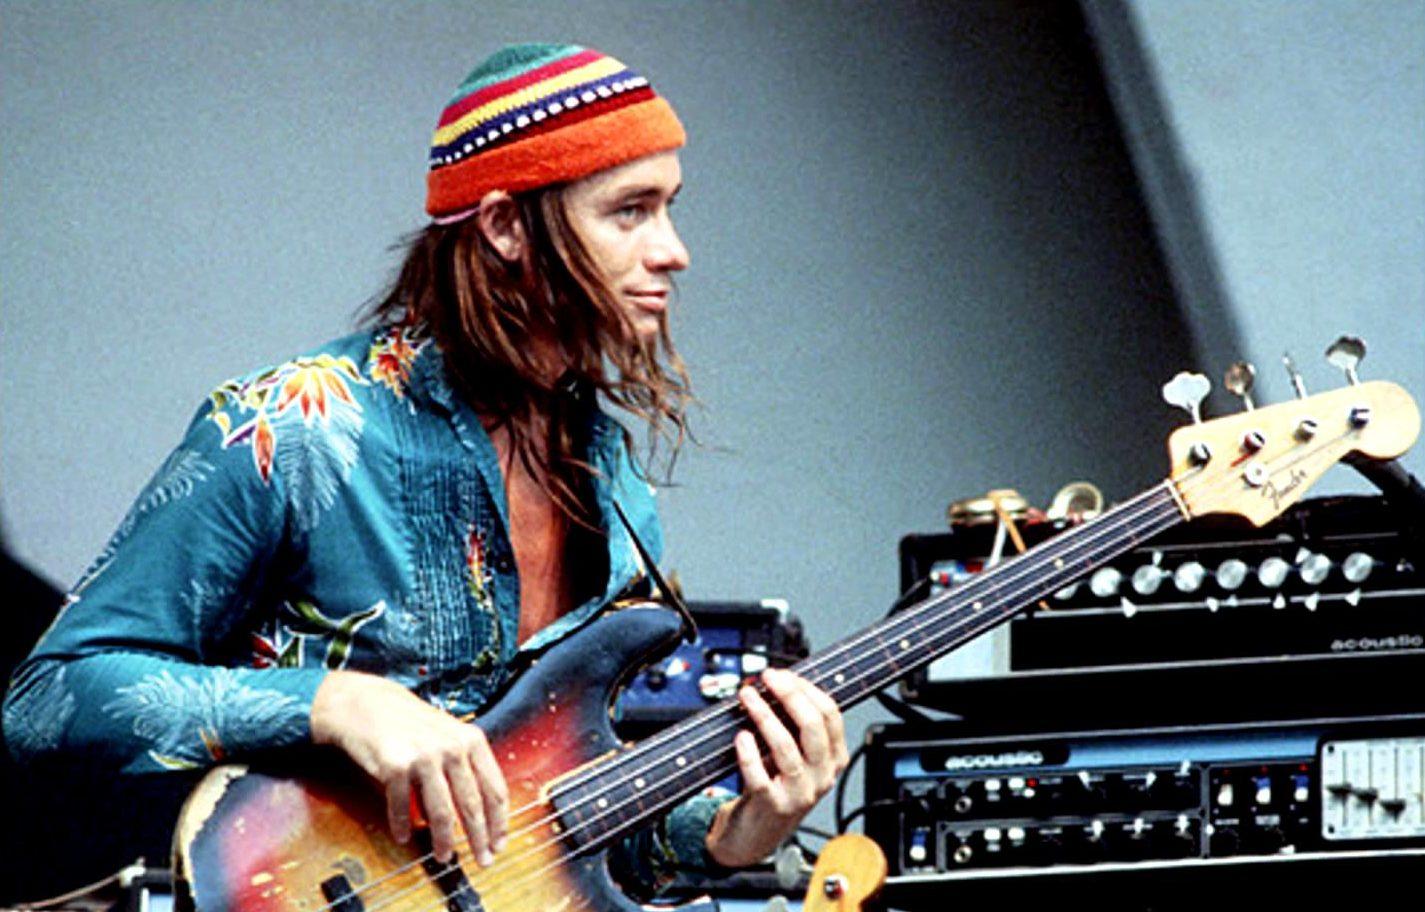 Jaco Pastorius: The Brief, Brilliant Life & Brash Death Of A Bass Legend [Videos]